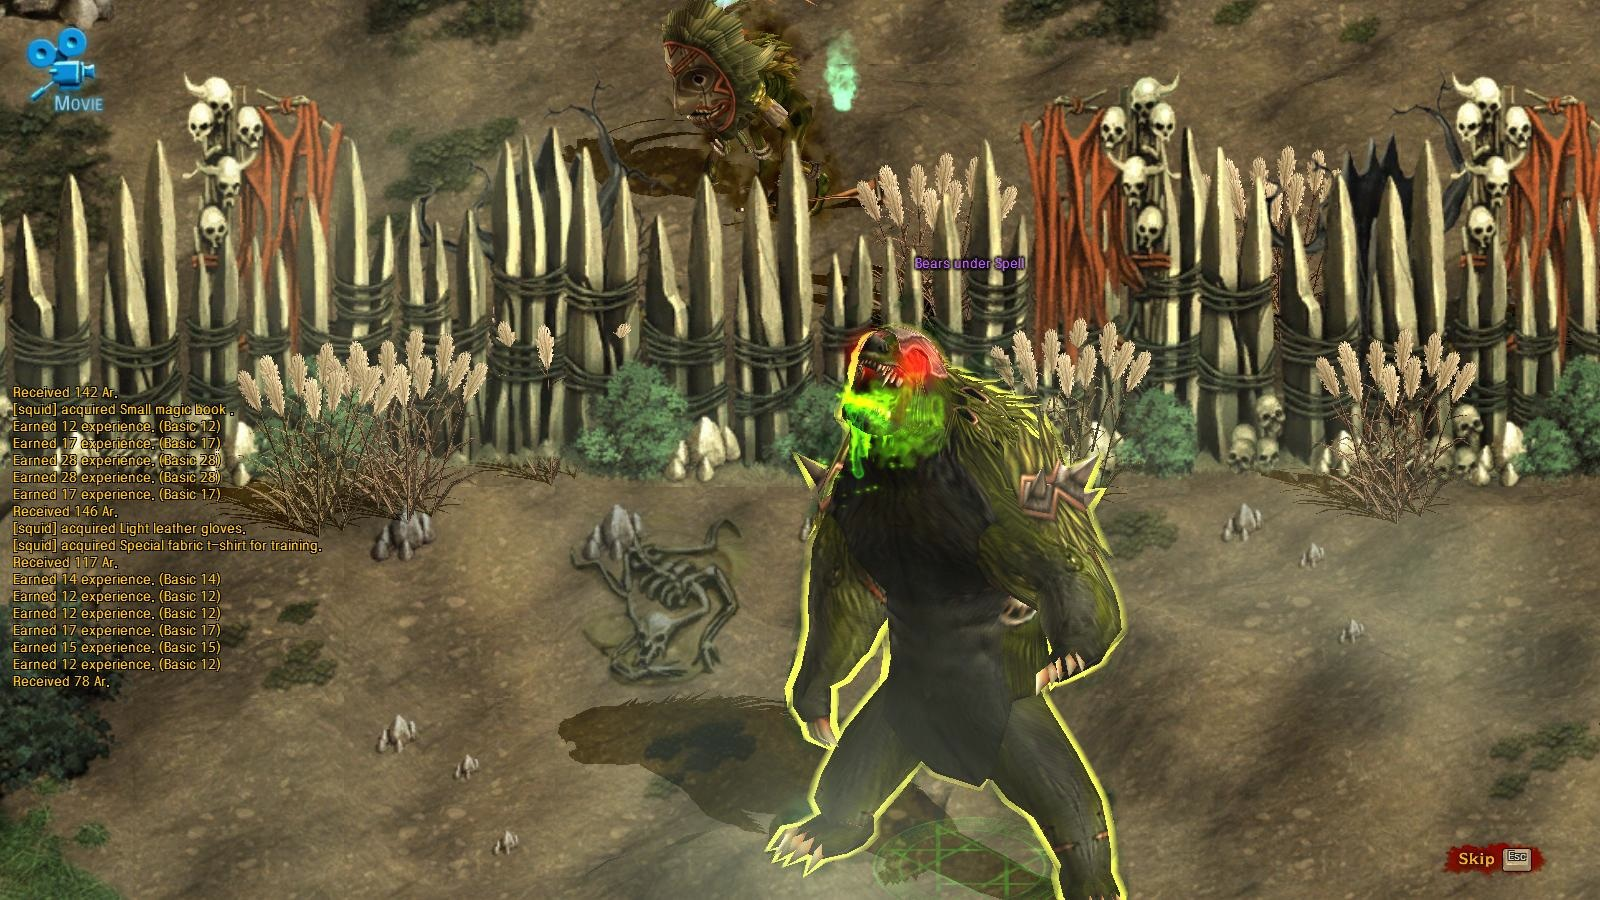 DarkBlood Quest boss 2